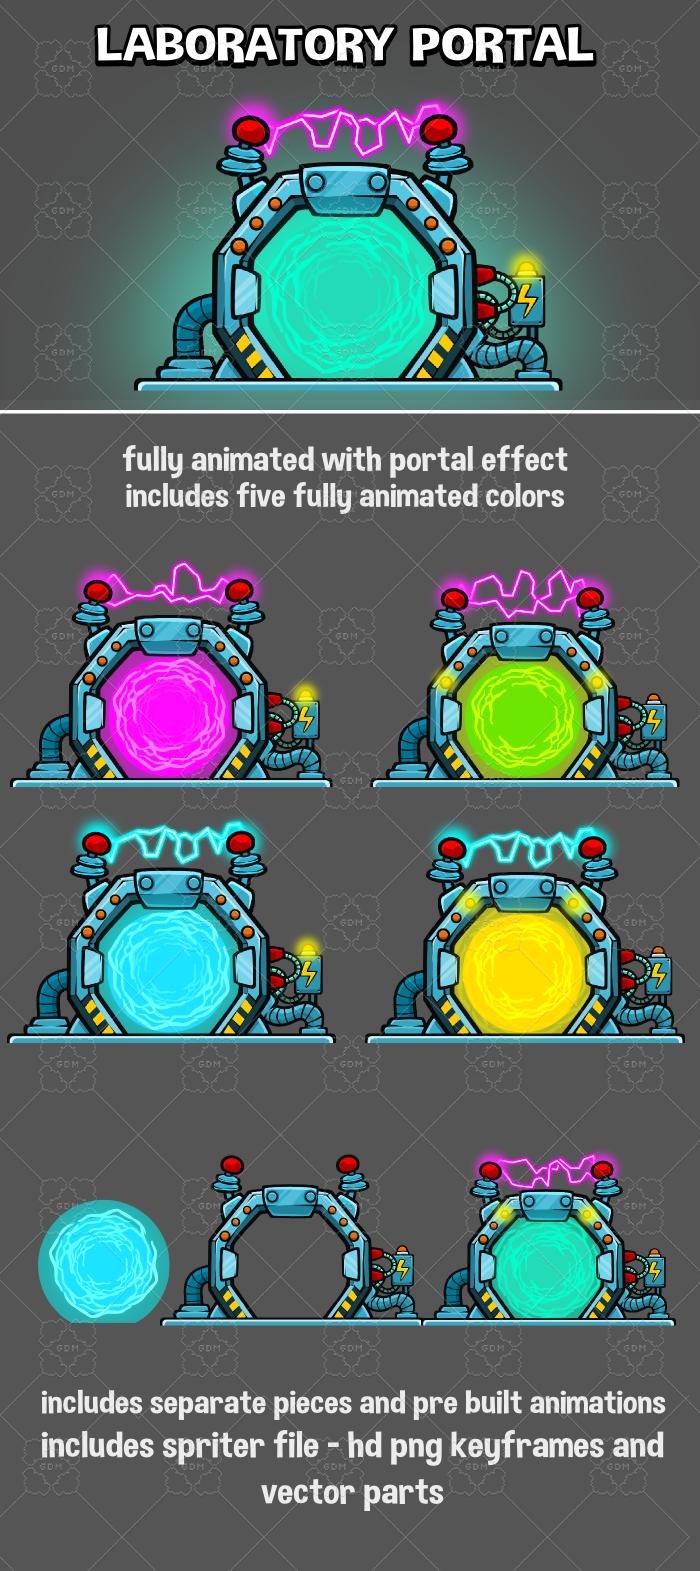 Laboratory portal